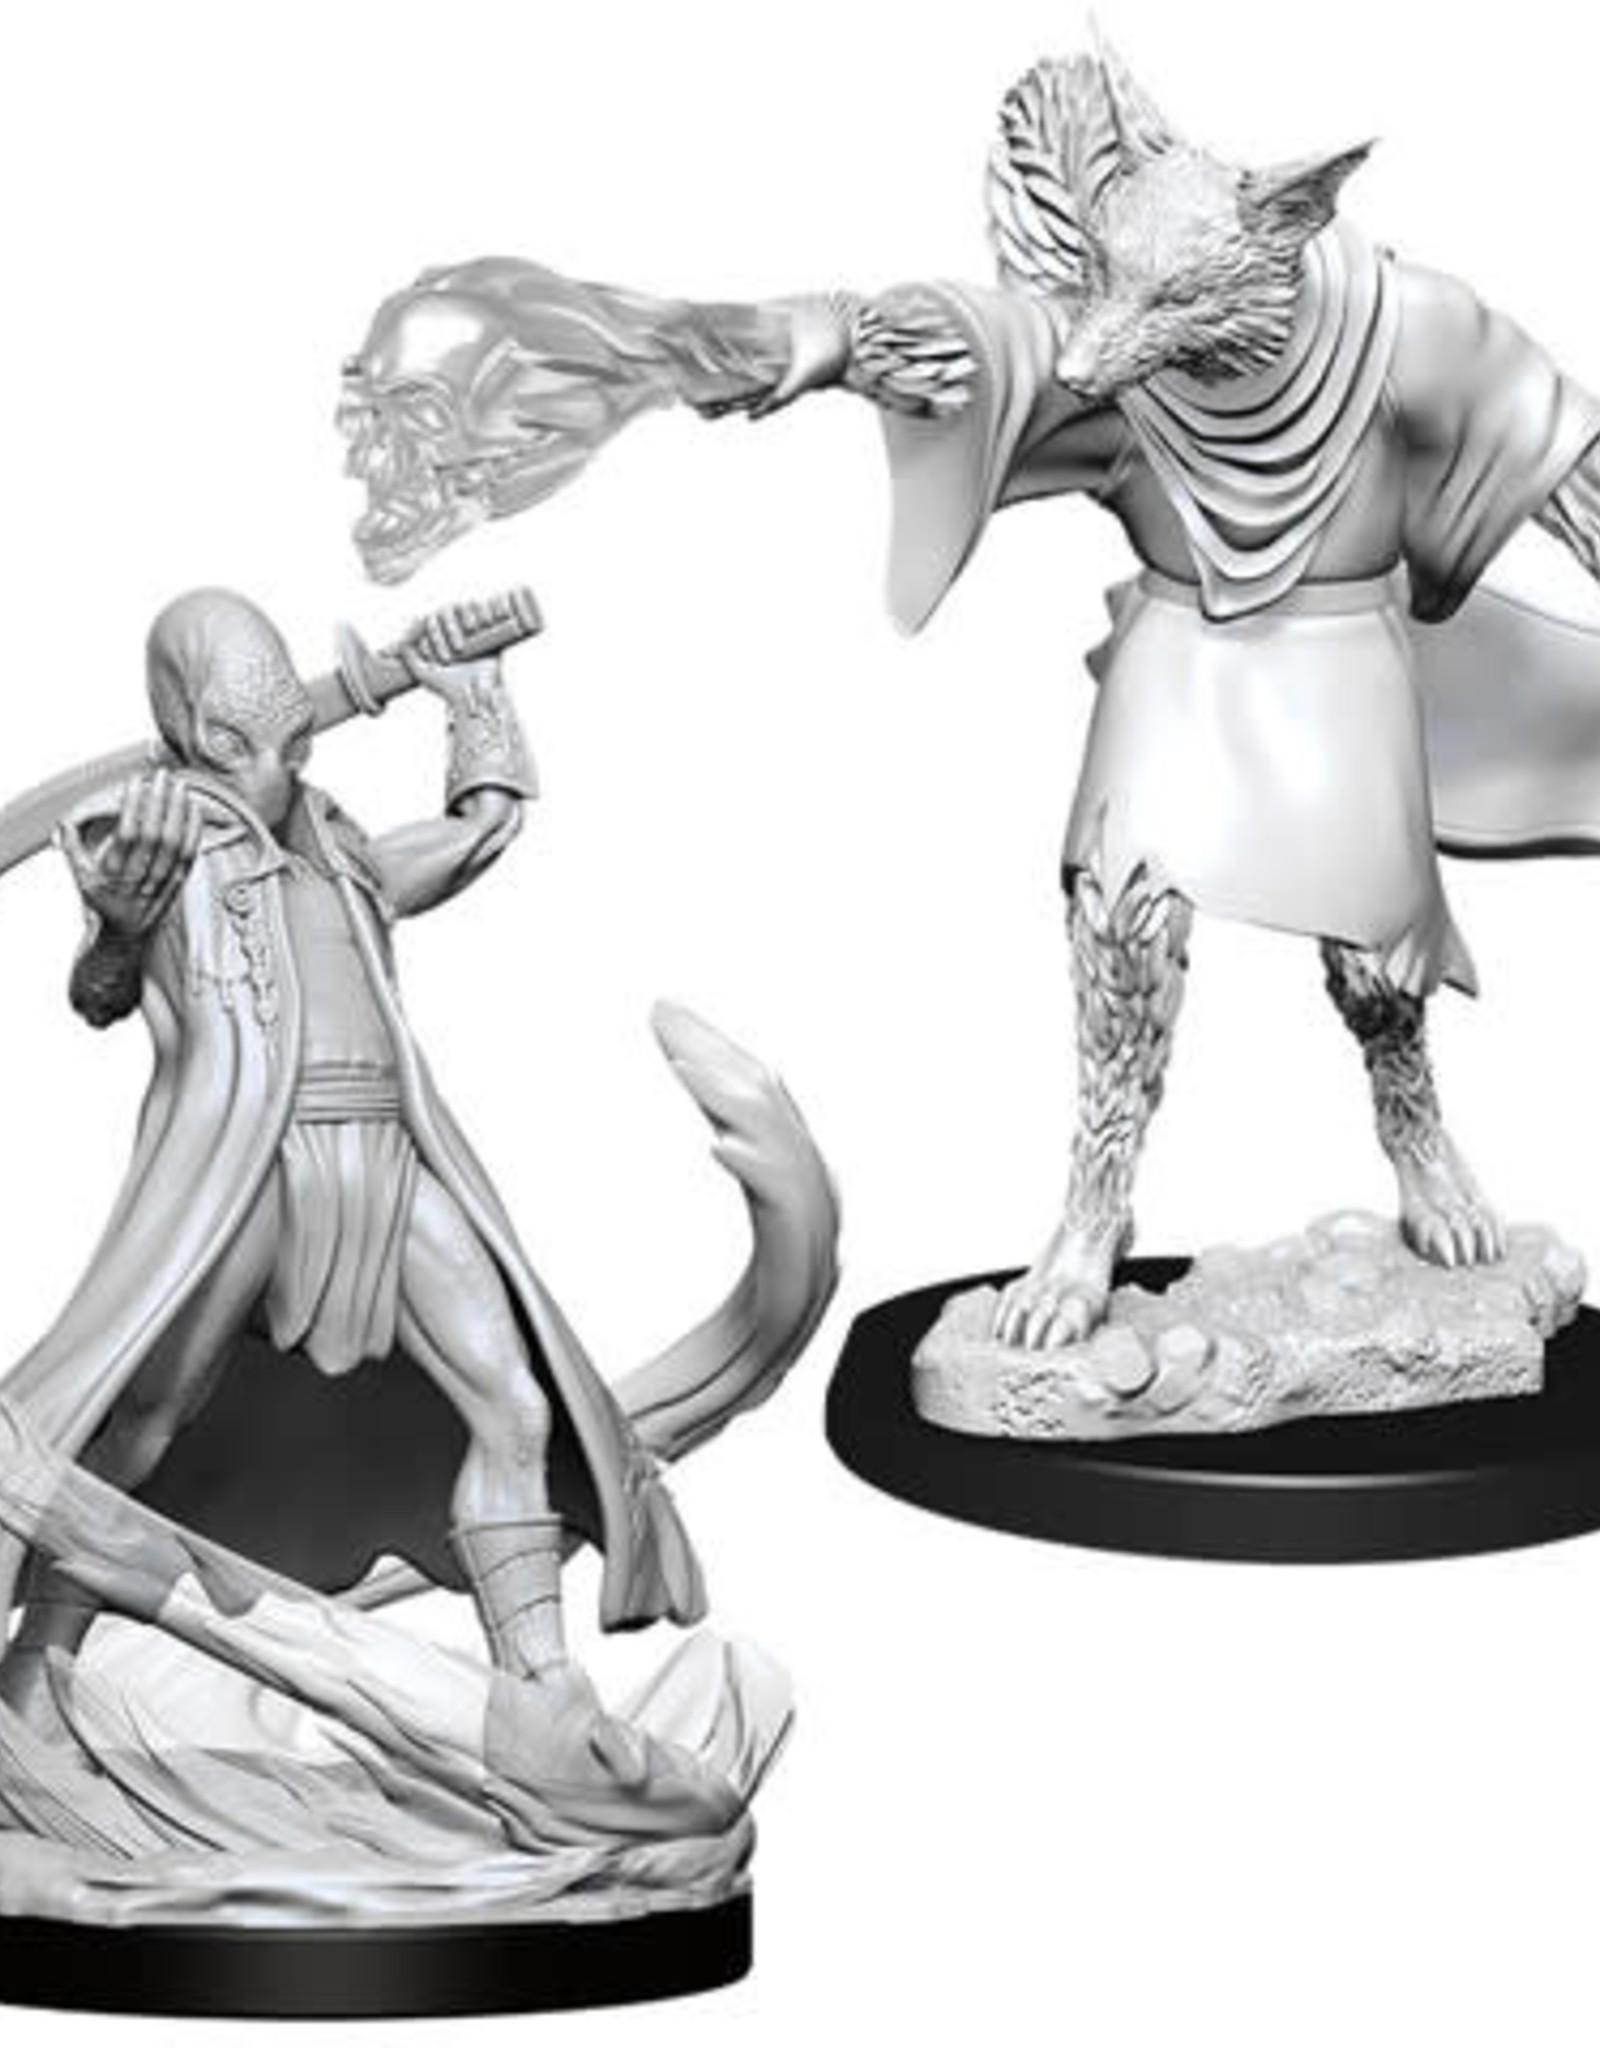 WizKids D&D Nolzur's Arcanaloth & Ultroloth